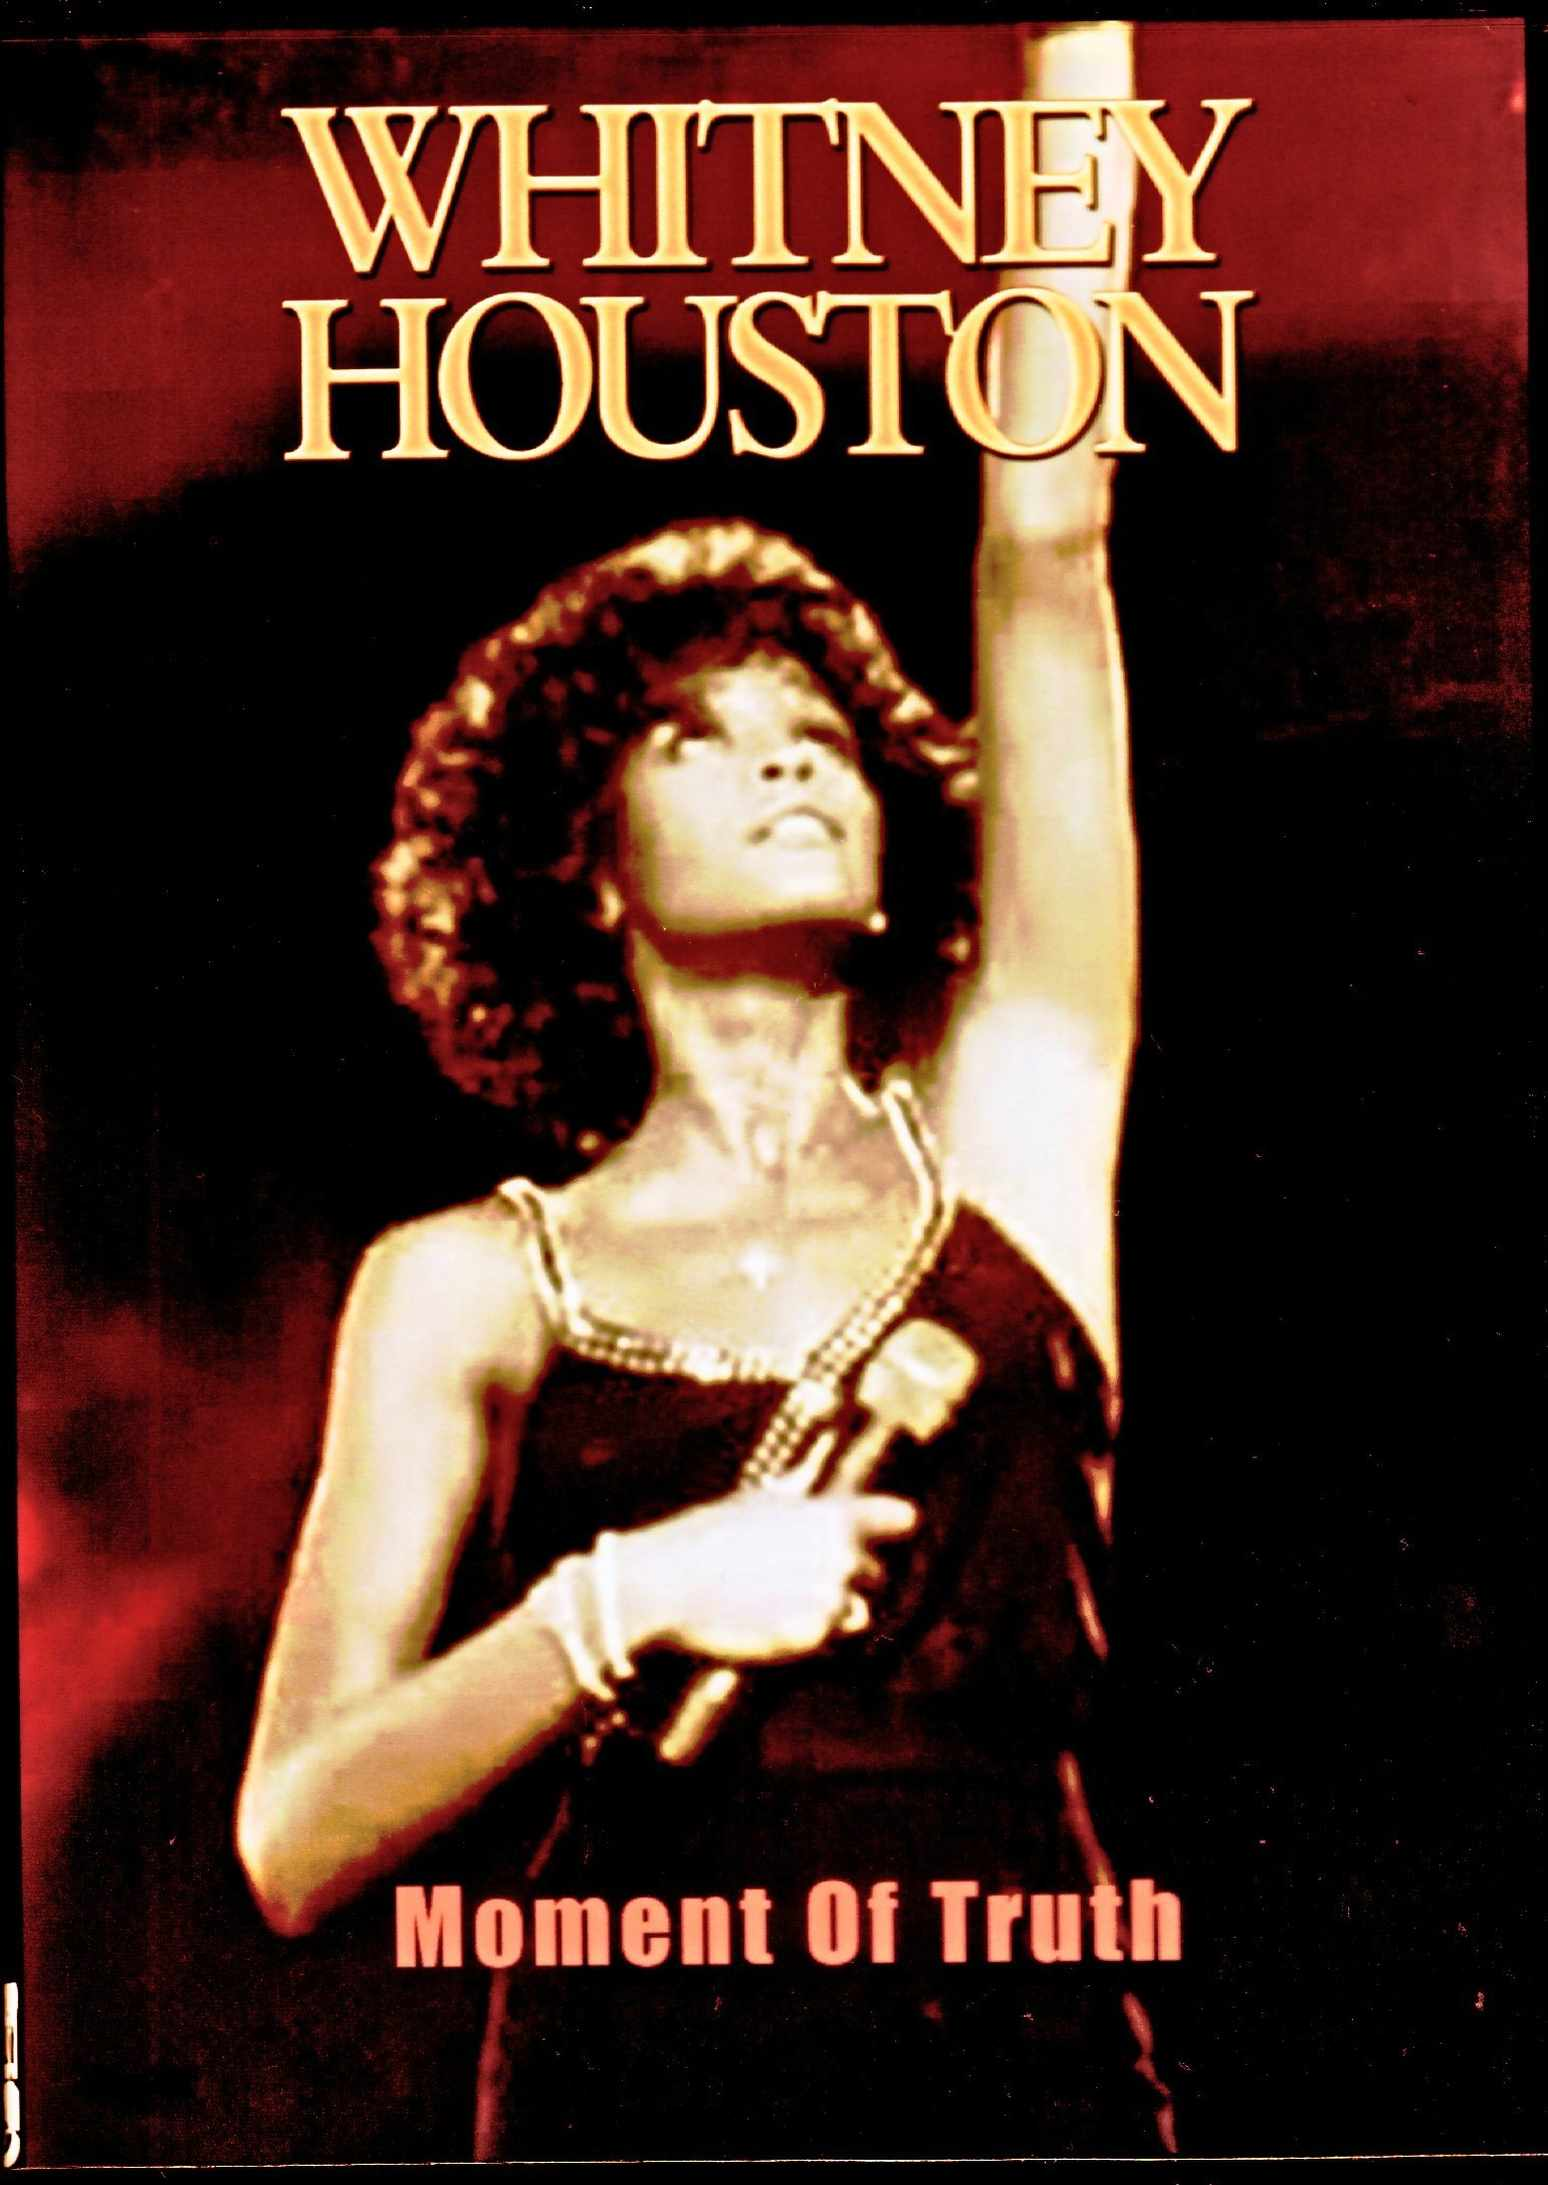 Whitney Houston ホイットニー・ヒューストン/殿堂入り記念映像集 横浜公演 1991年 他